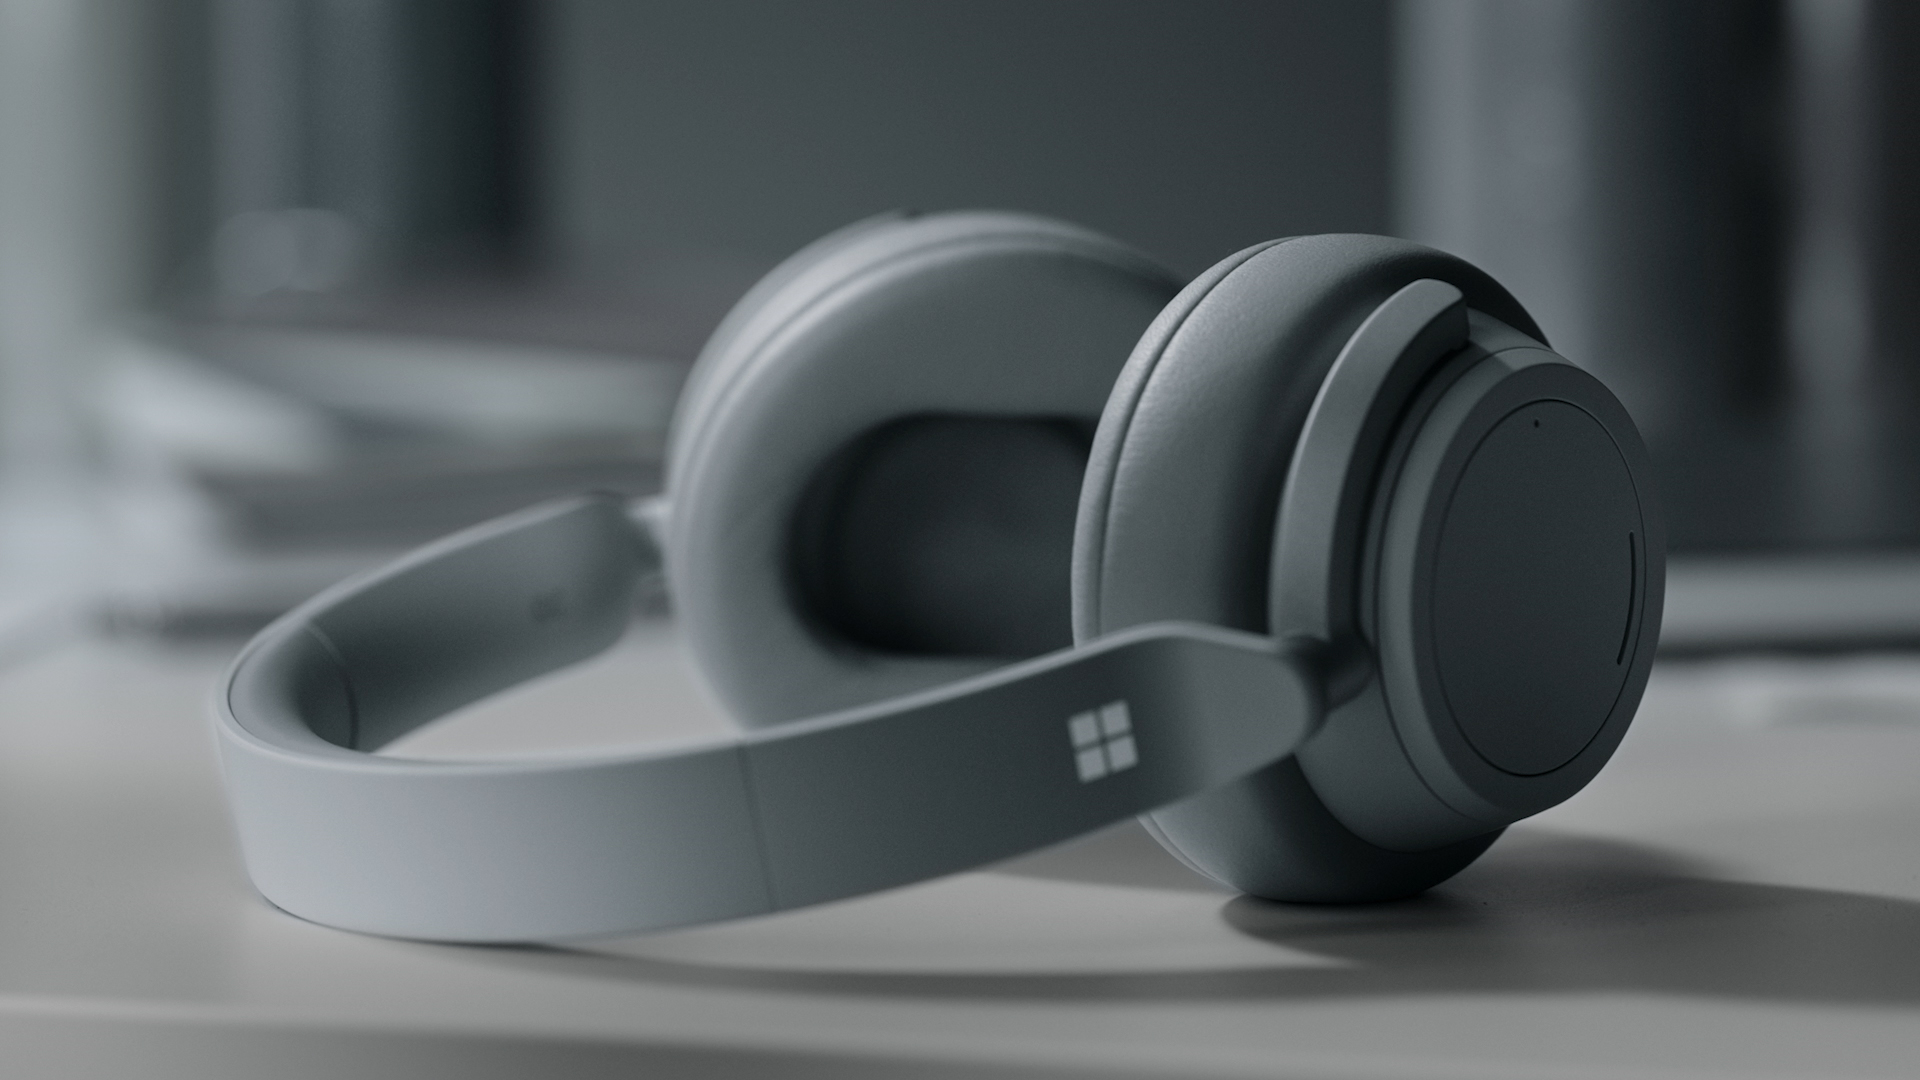 meet the new surface headphones the smarter way to listen microsoft surface [ 1920 x 1080 Pixel ]